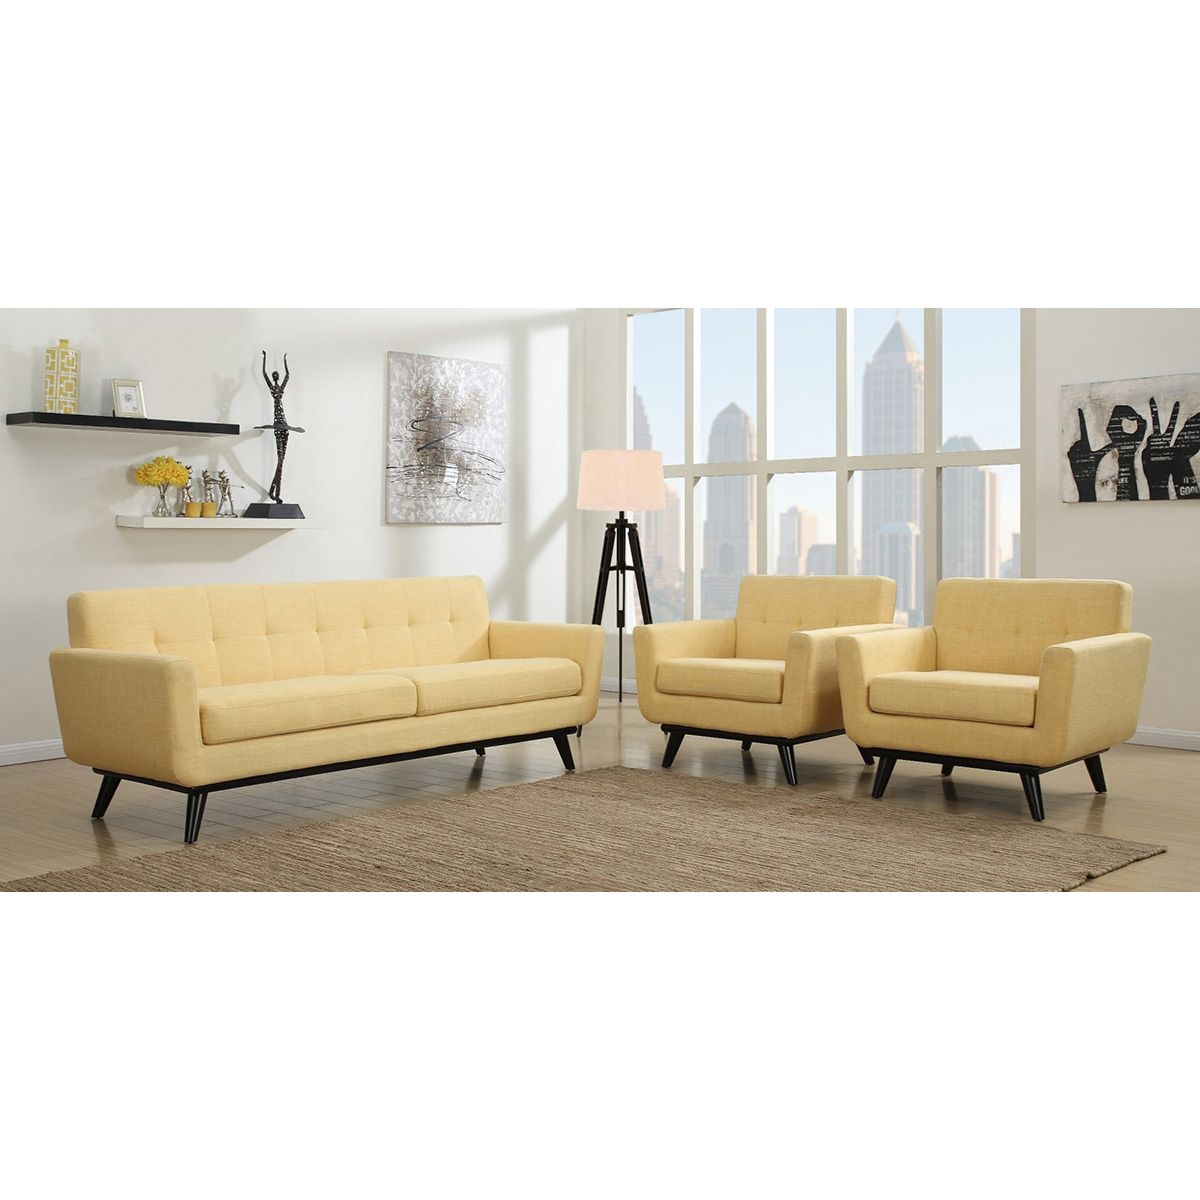 TOV Furniture James Mustard Yellow Linen Sofa TOV-S20S-Y | TOV ...